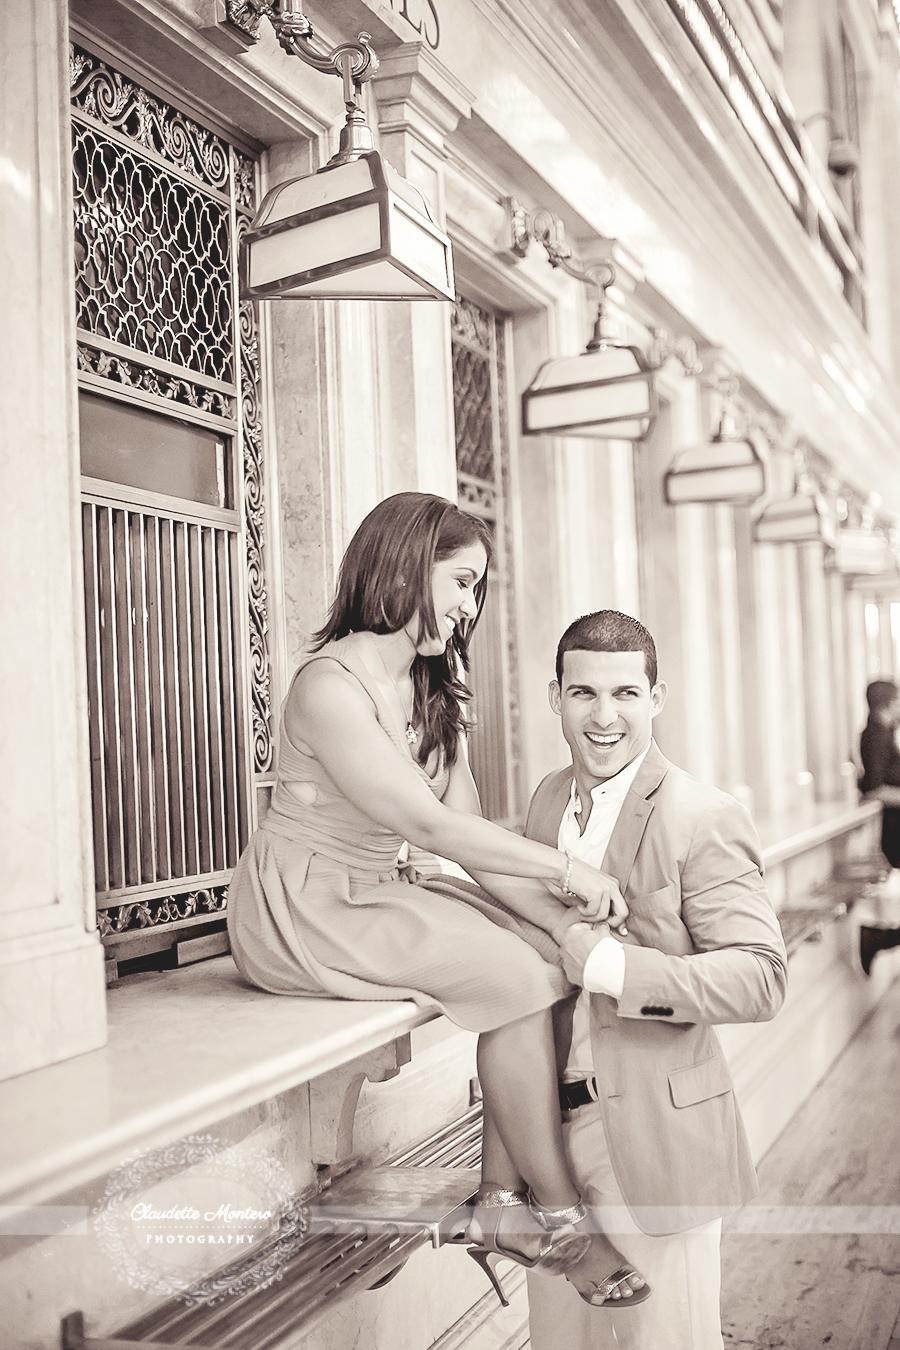 claudette-montero-photography-amaris-emmanuel-new-york-engagement-session-yaska-crespo-wedding-planner-web-logo-9816